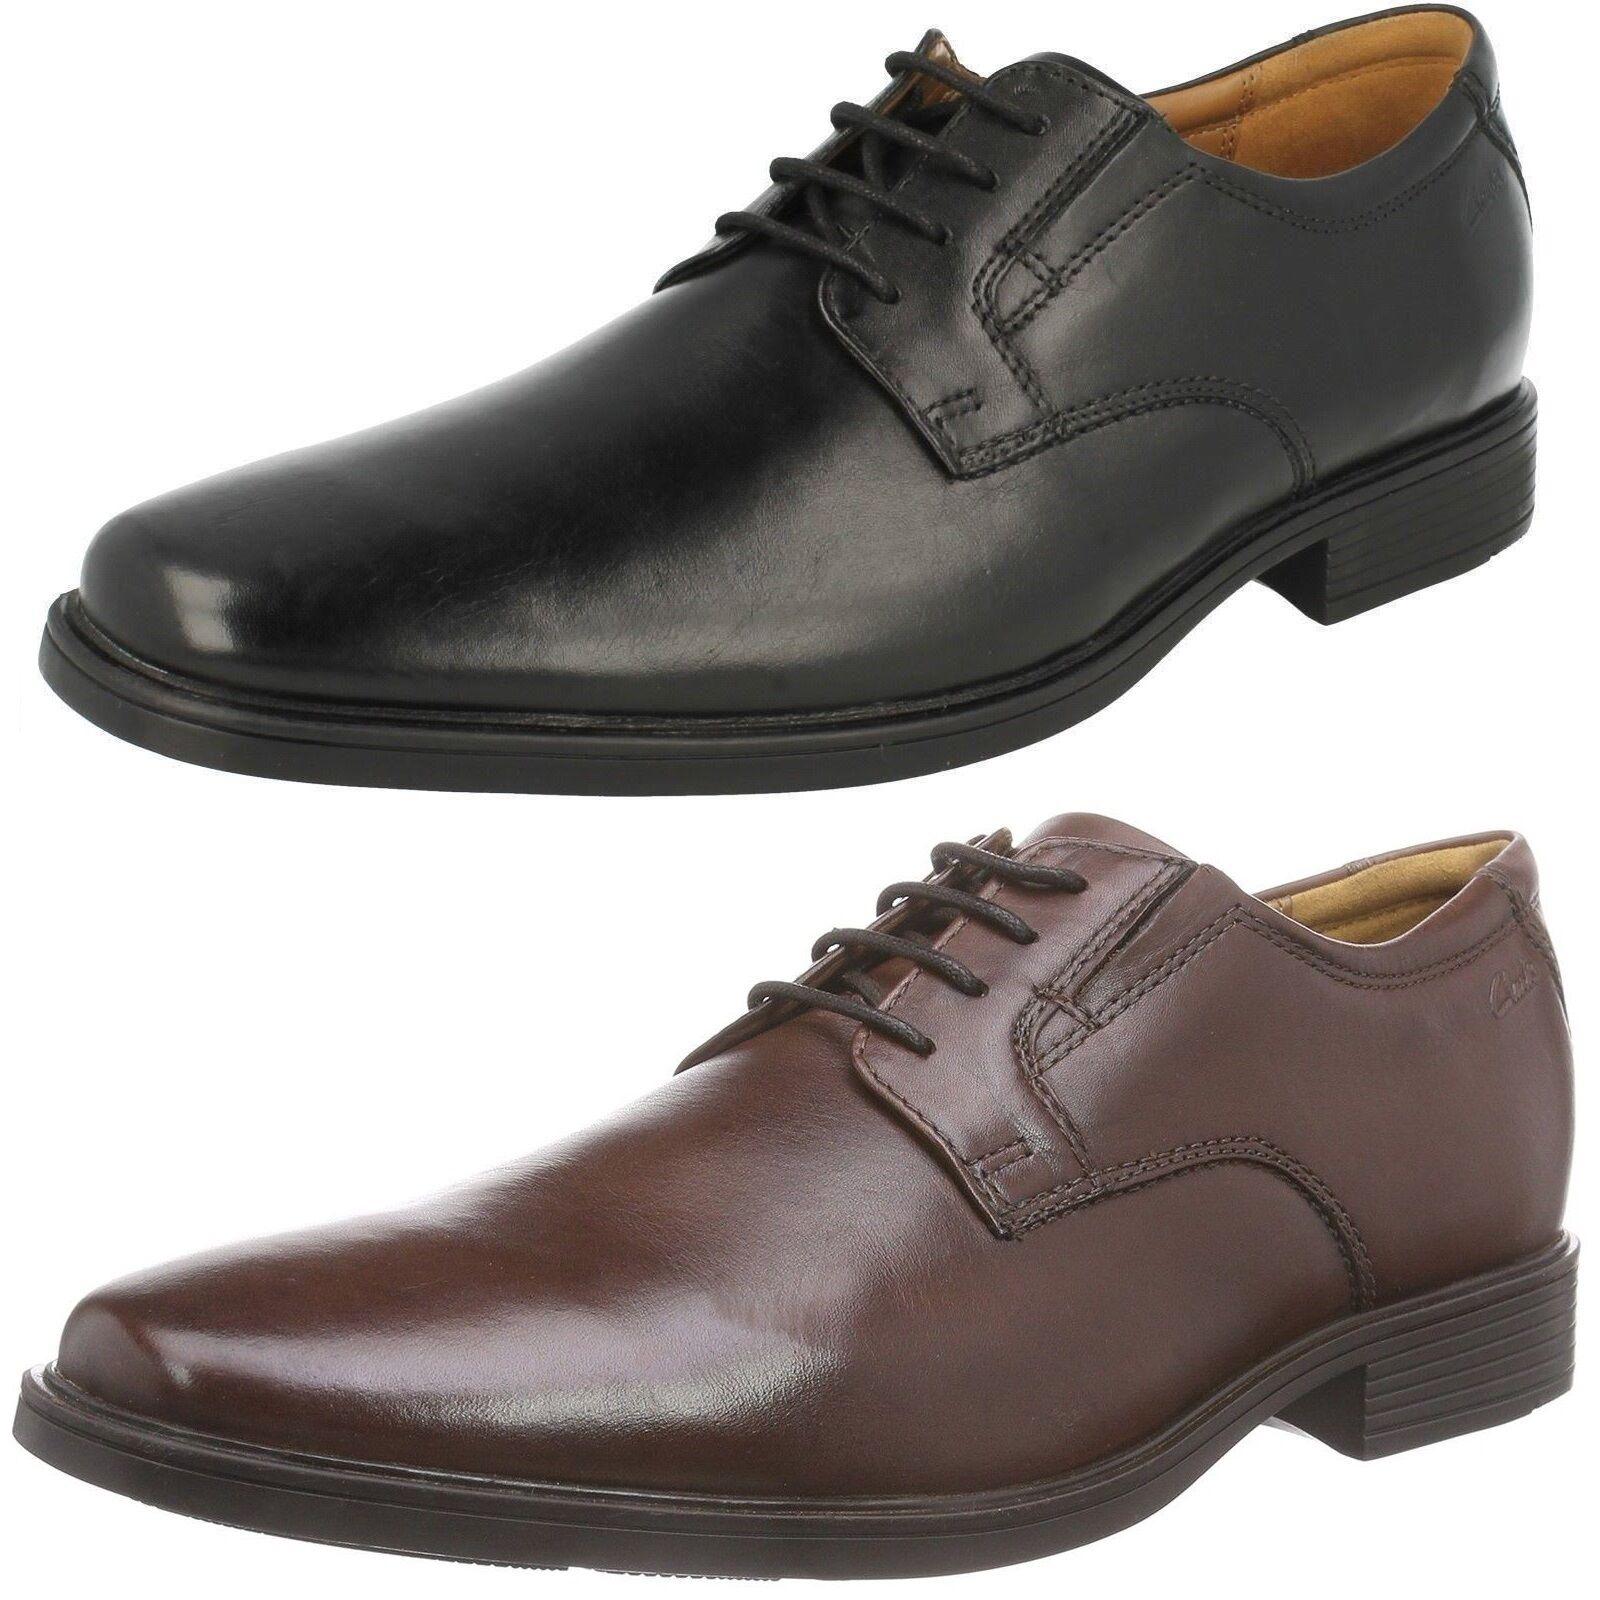 ccc399a4788f1 Plain Mens Gibson shoes CLARKS Tilden nsznde3285-Formal Shoes ...